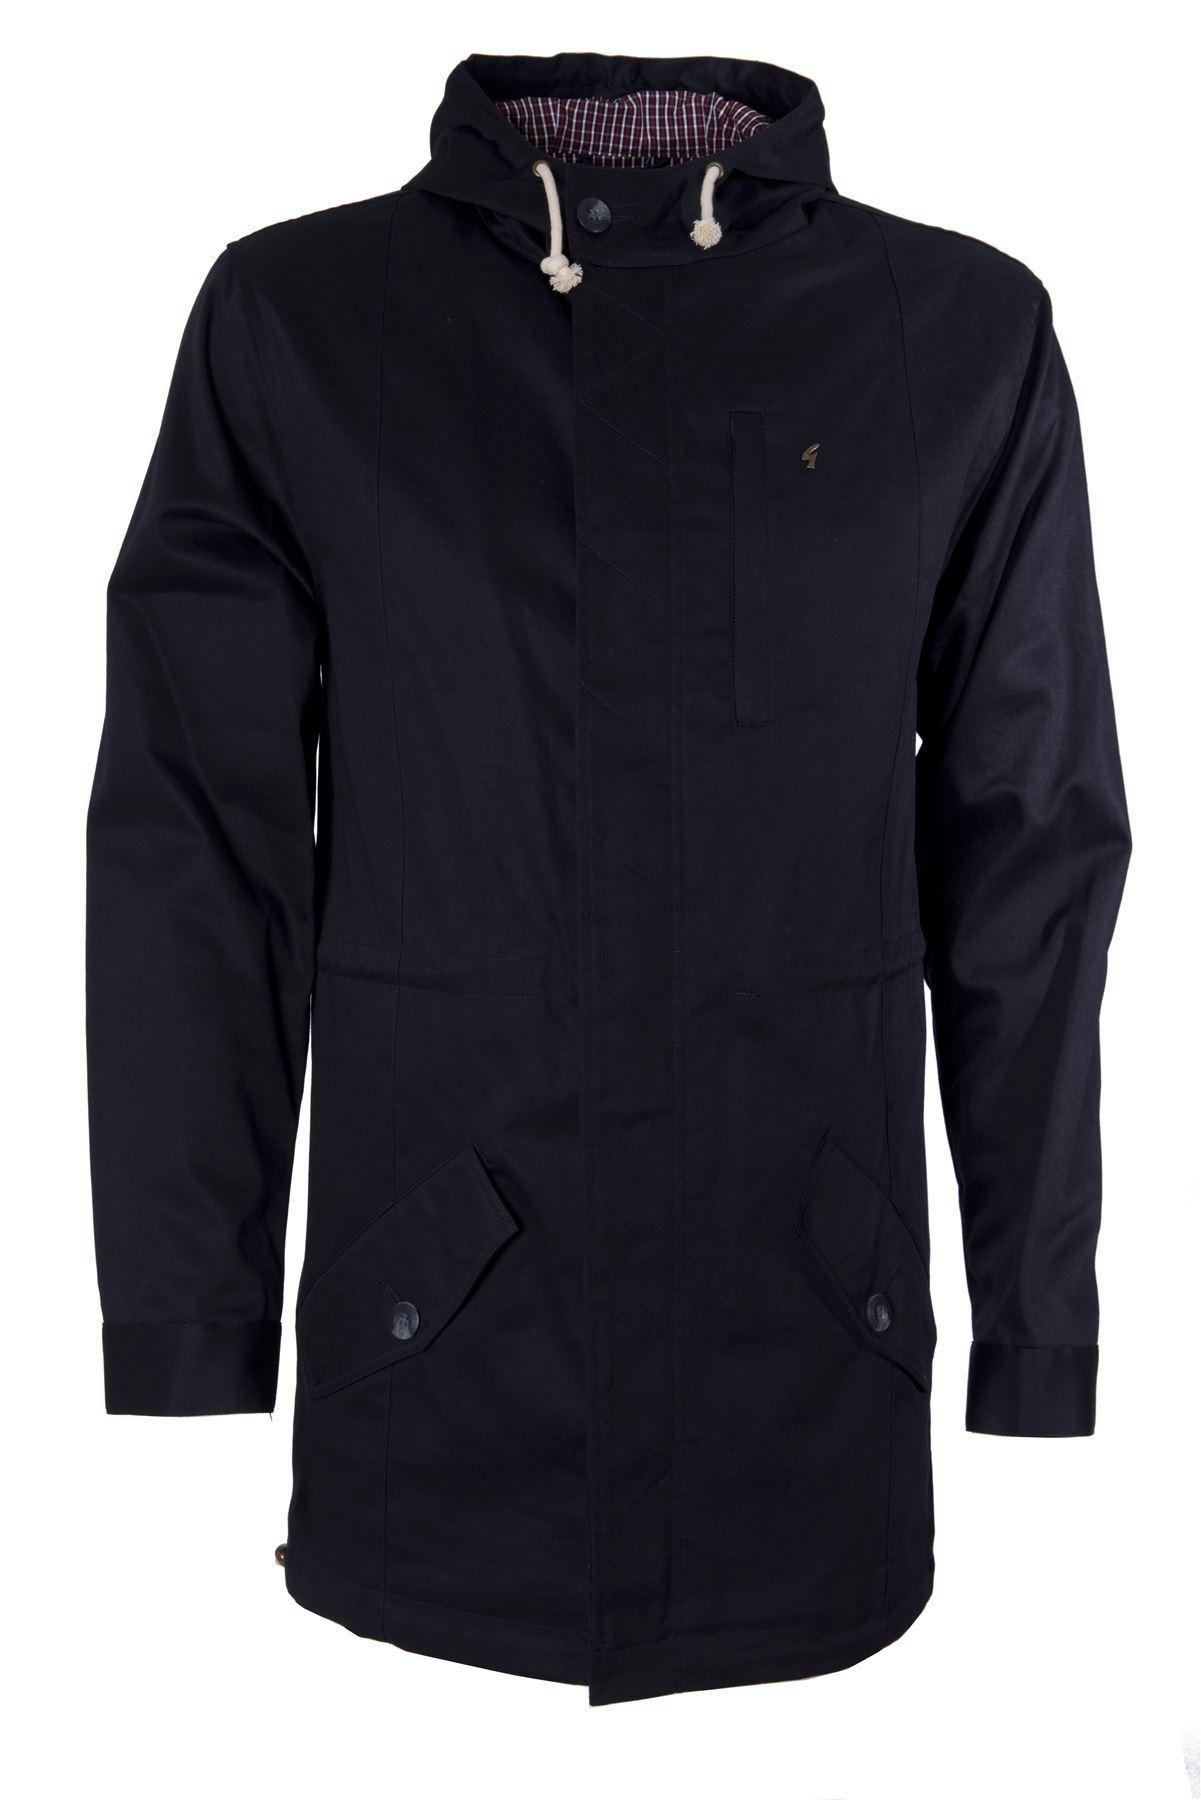 Men's Auburn Zip-Front Golf Jacket (Regular & Big-Tall Sizes)